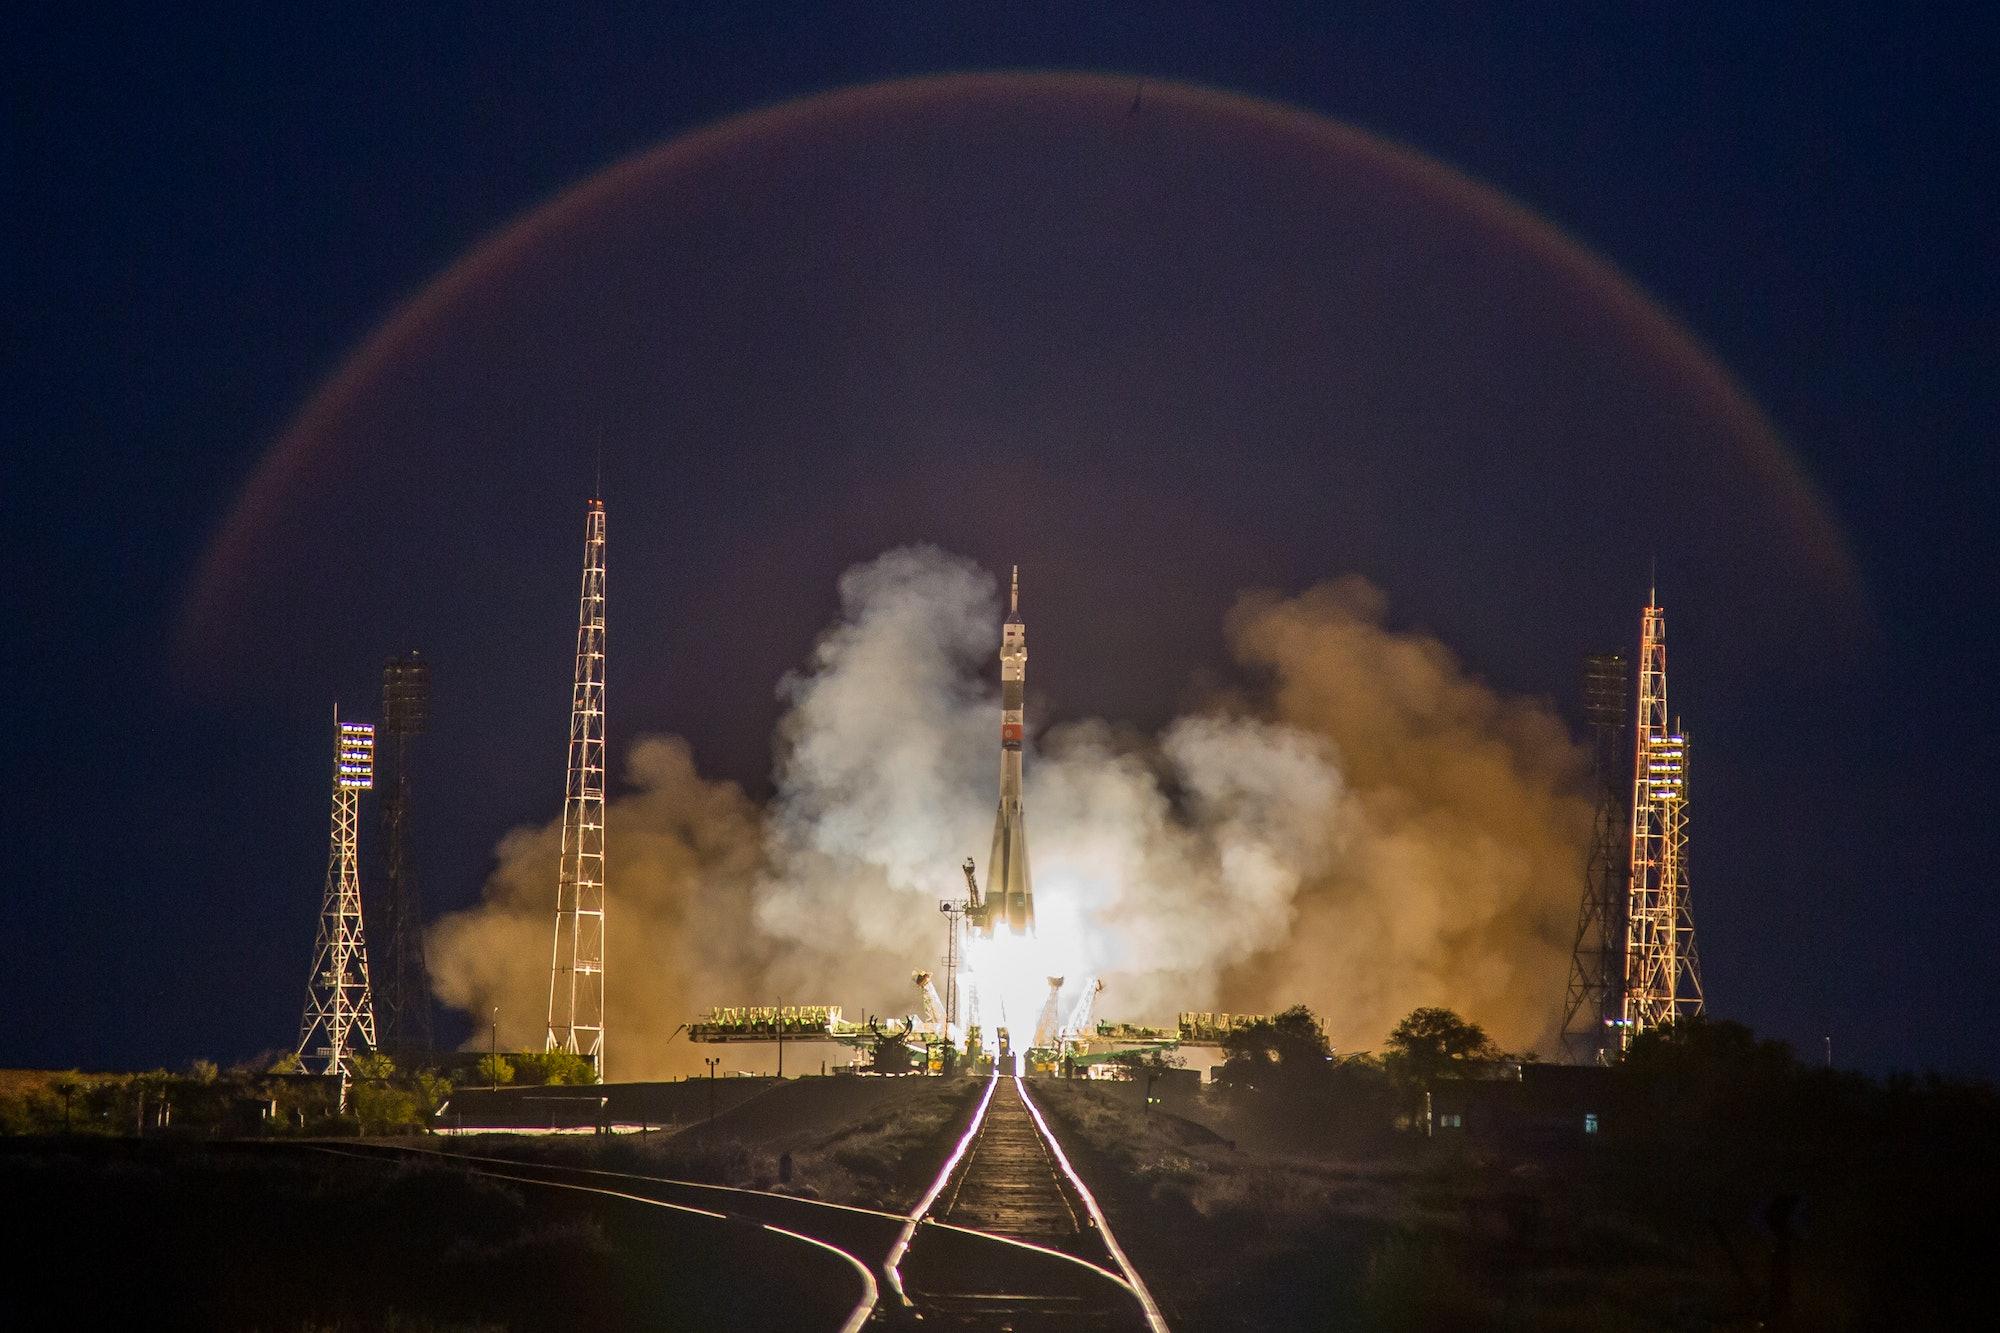 The Soyuz mission taking off.